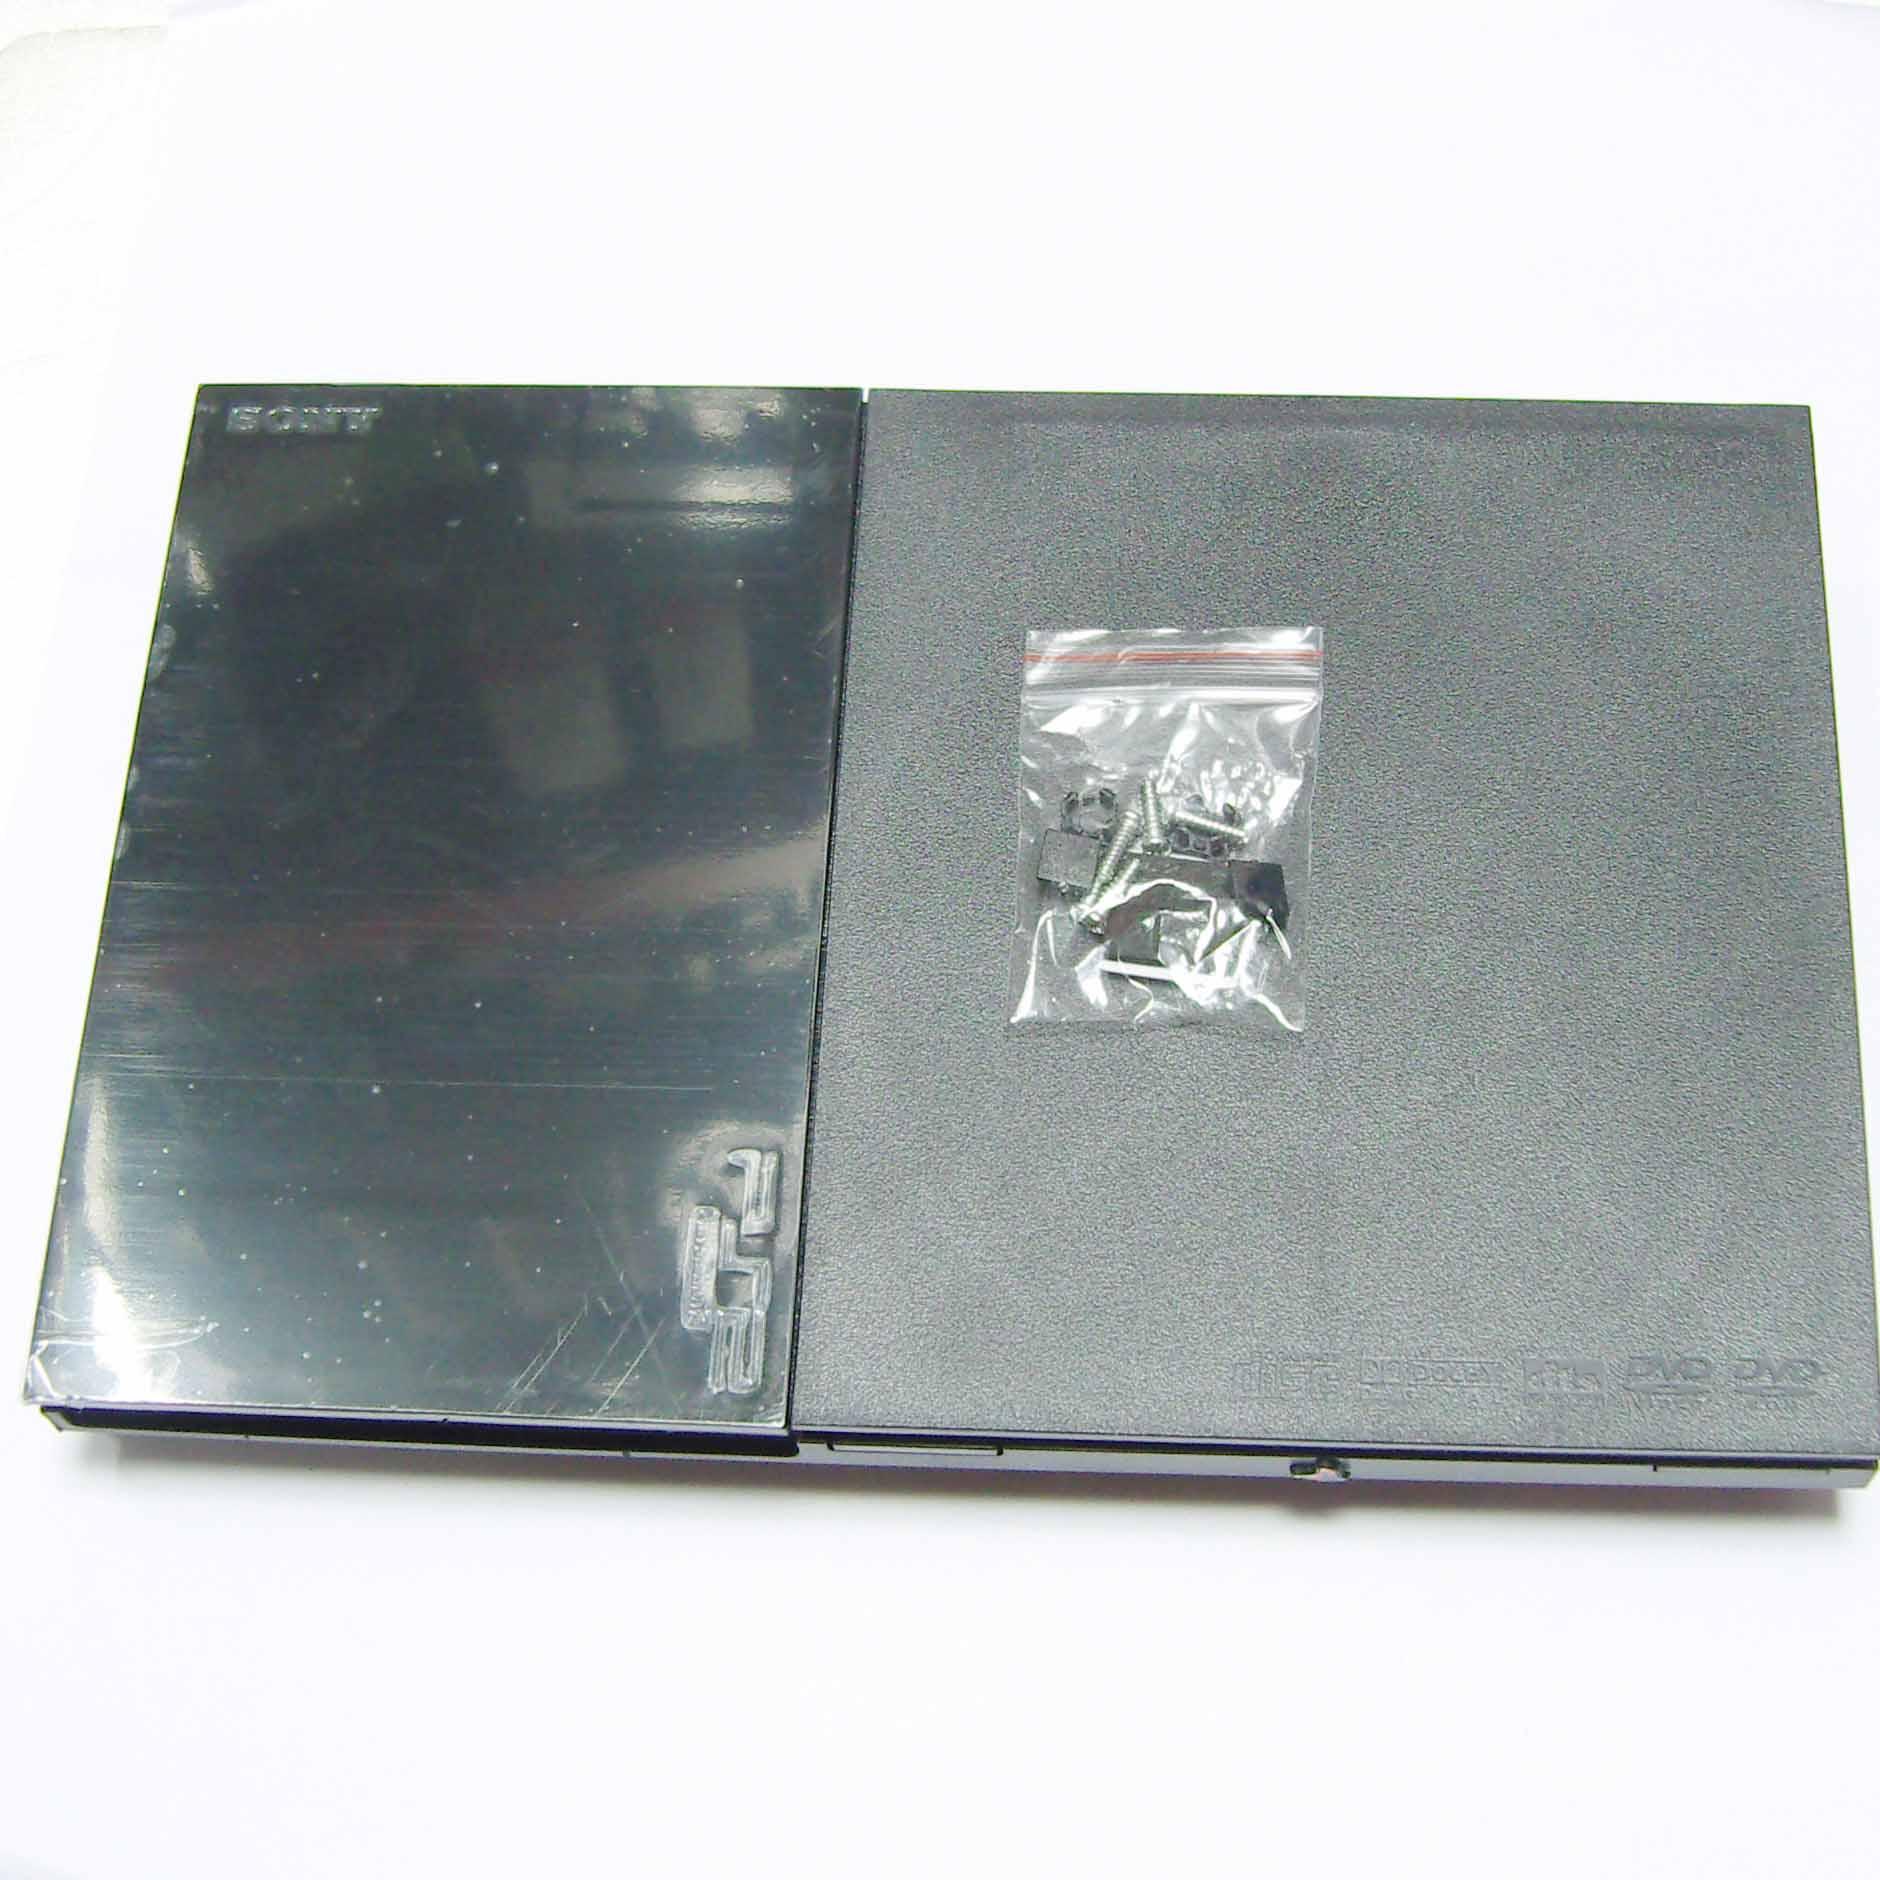 Carcasa completa de alta calidad cubierta de host para PS2 Slim 9000X9 W 90000 para consola PS2